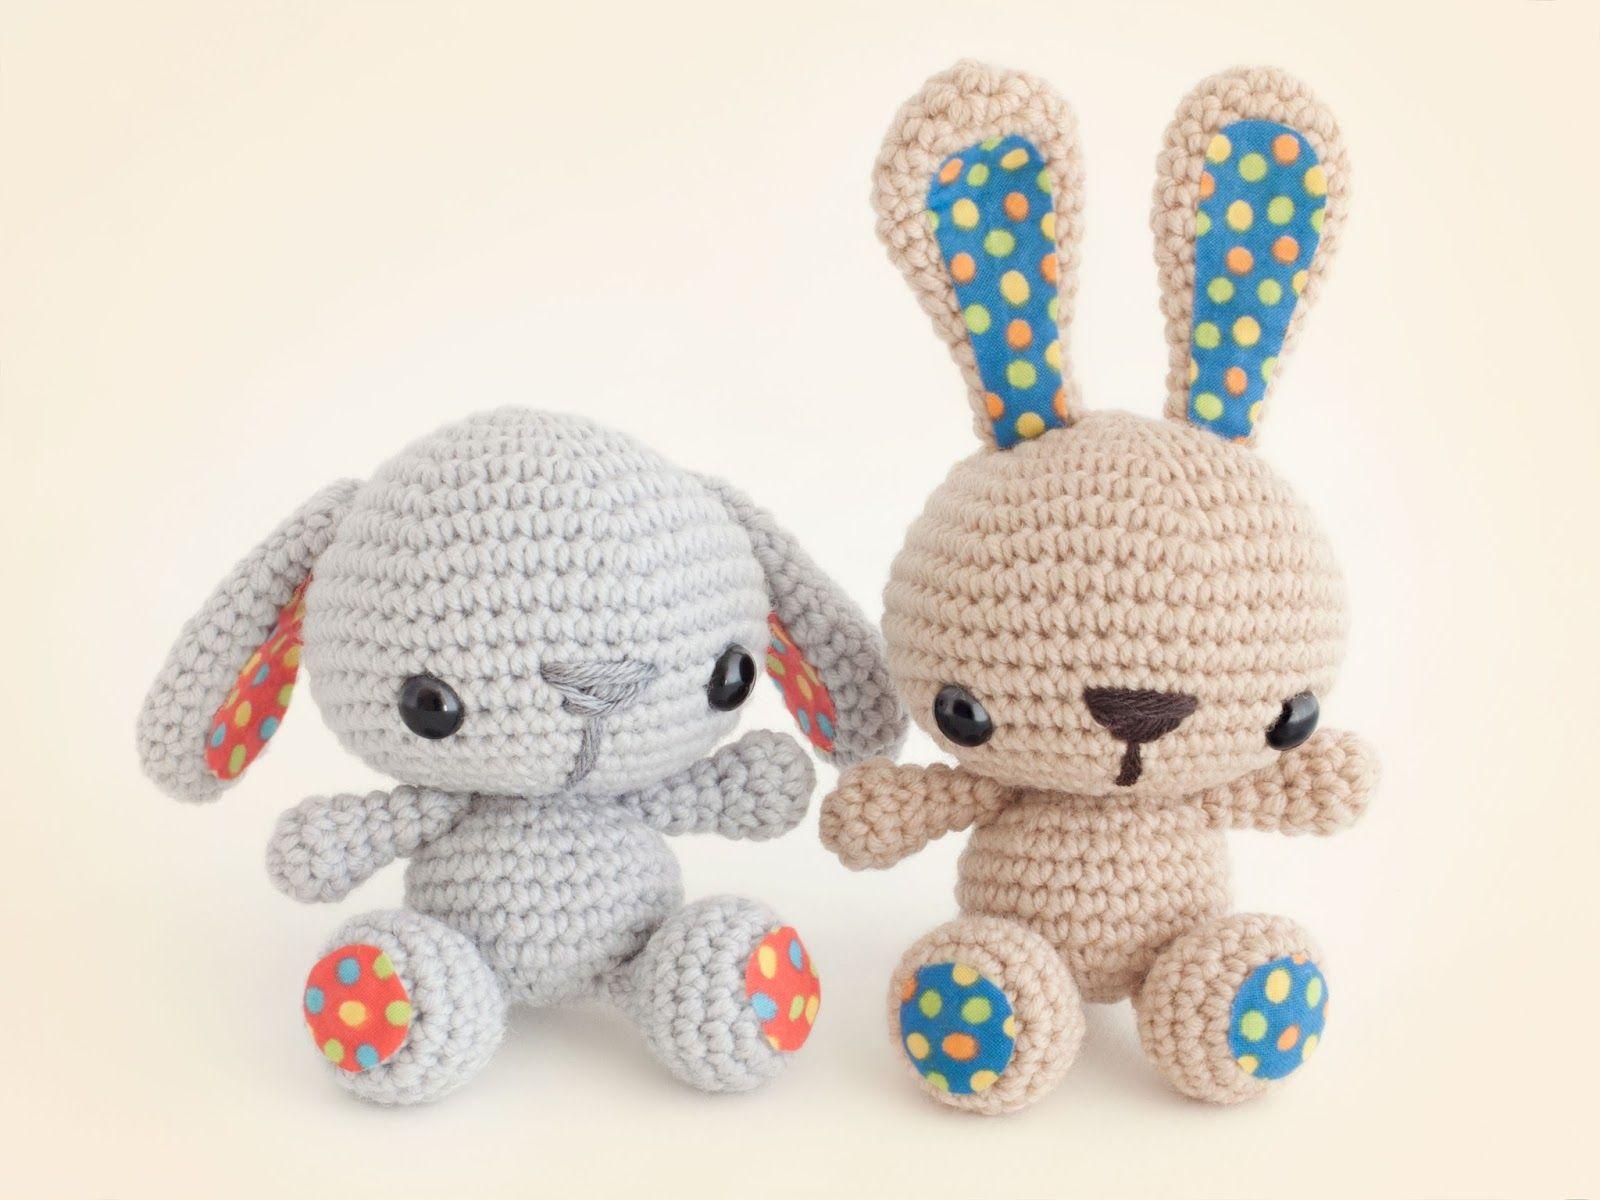 Amigurumi Bunny - FREE Crochet Pattern / Tutorial | Haken ...